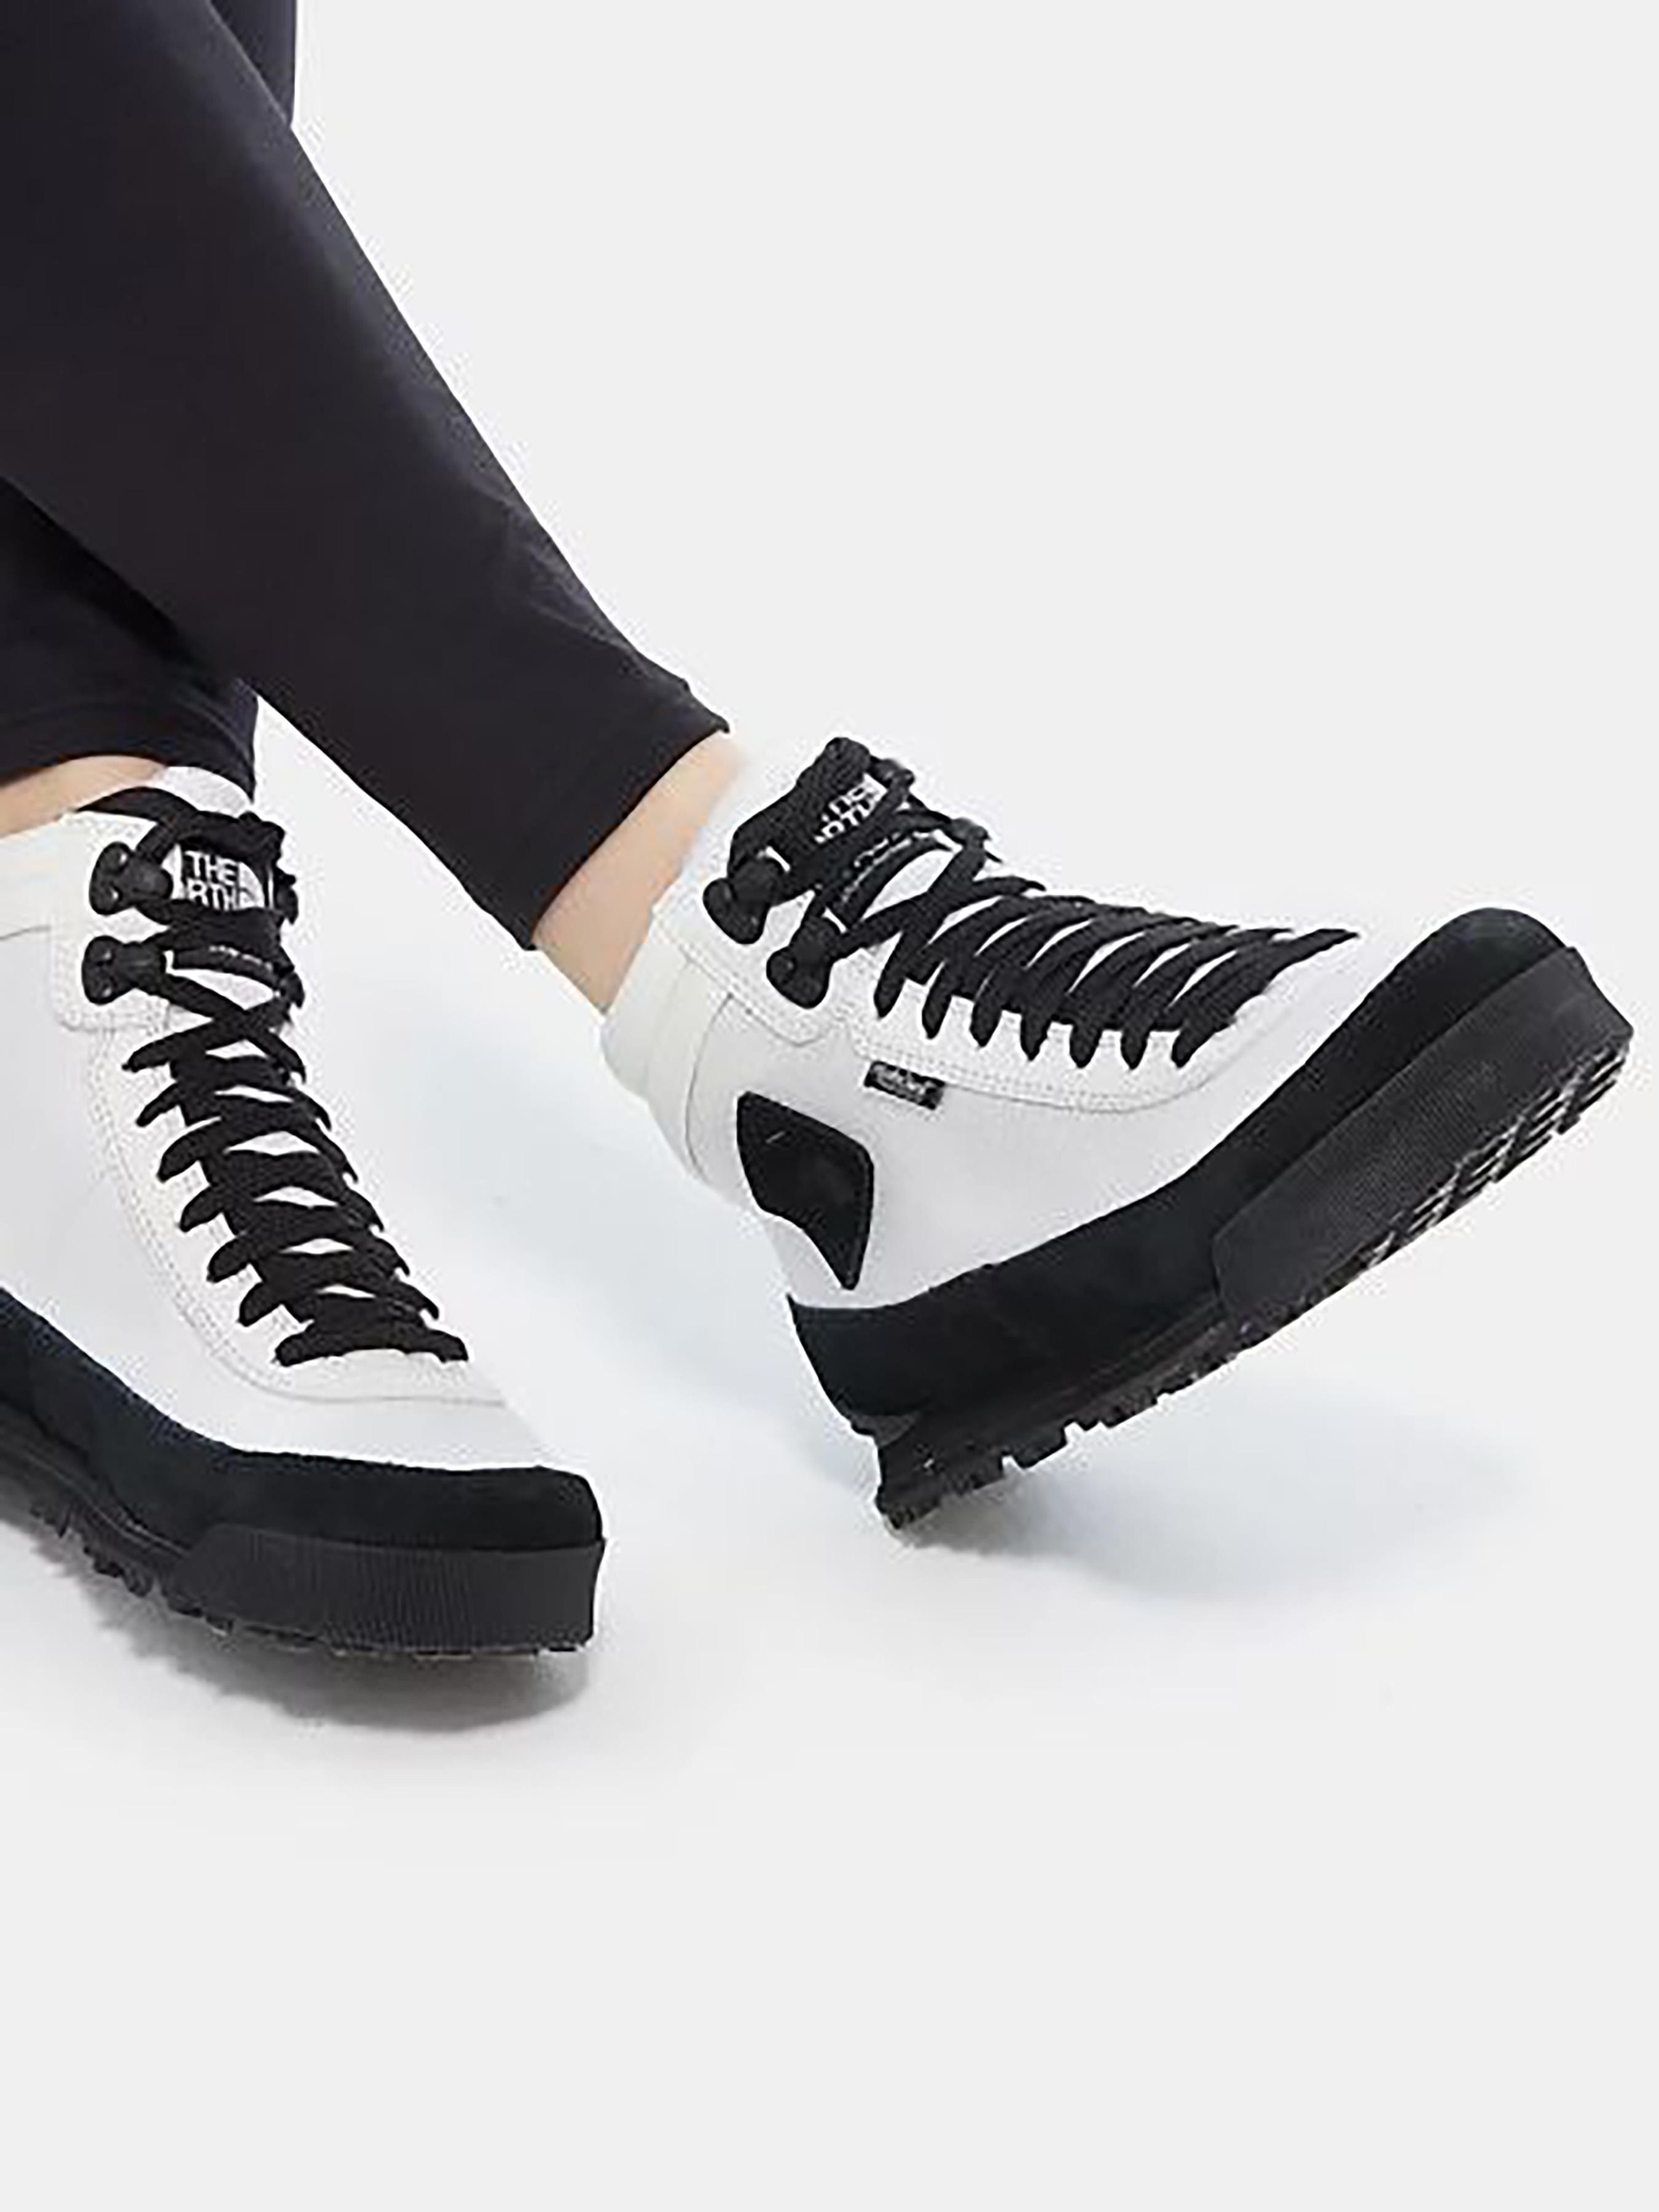 Ботинки для женщин The North Face Back-To-Berkeley Boot II NO9810 цена, 2017